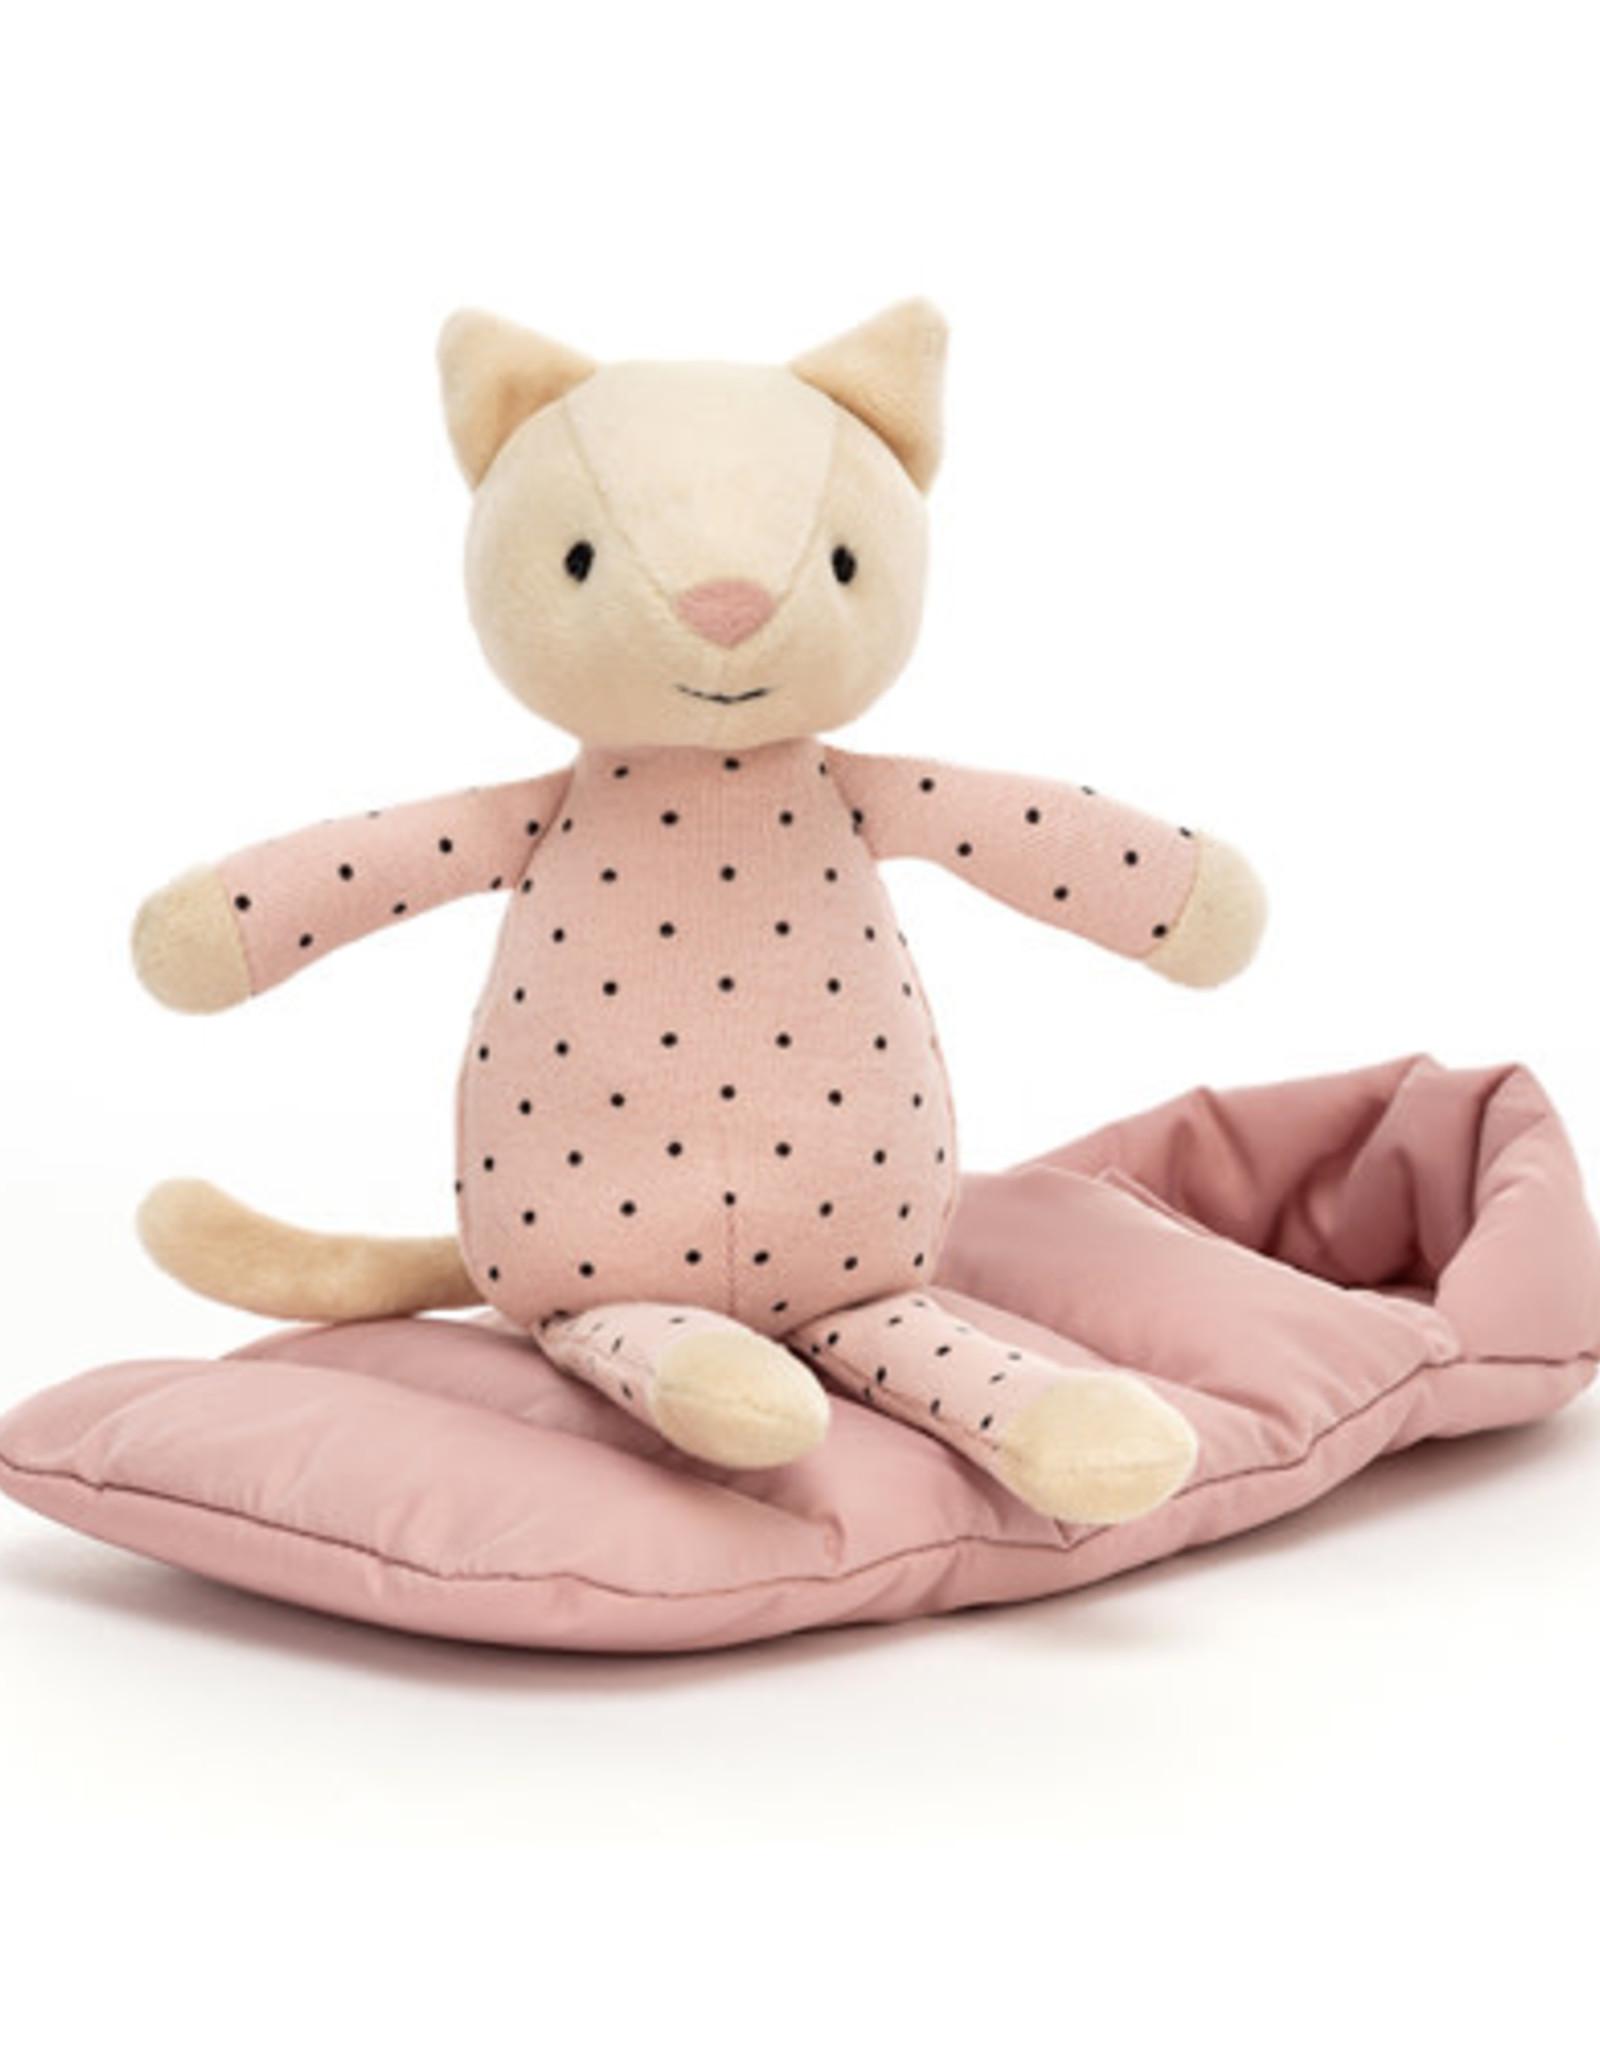 Jellycat Snuggler Cat